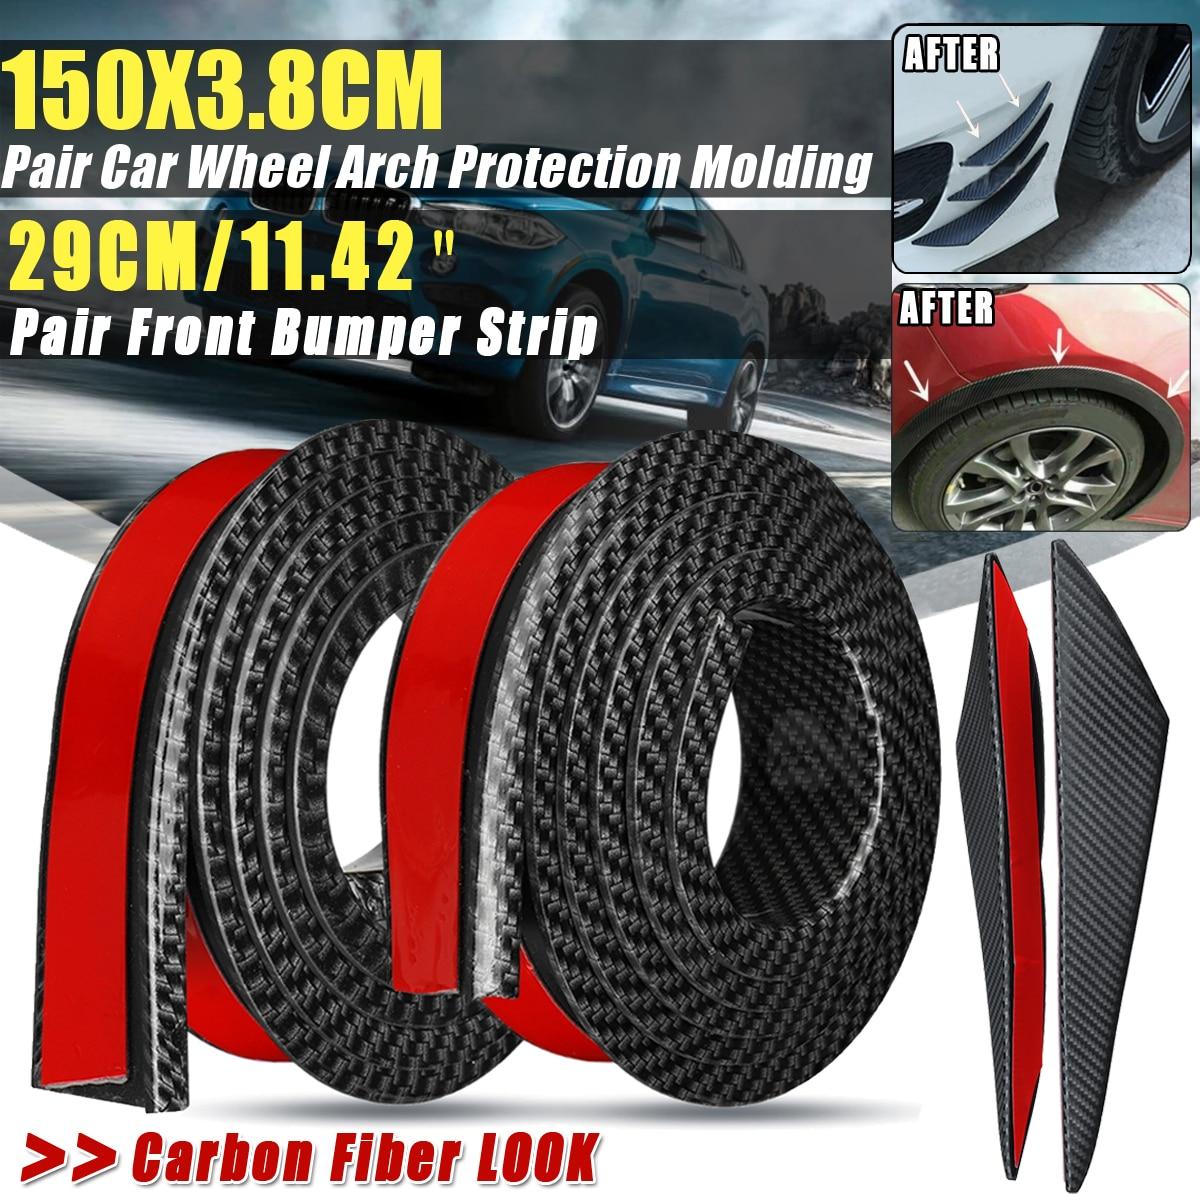 Universal 4x 2x 150x3.8CM Rubber Car Mudguard Trim Wheel Arch Protection Moldings Black/Carbon Black Front Bumper Anti-rub Strip